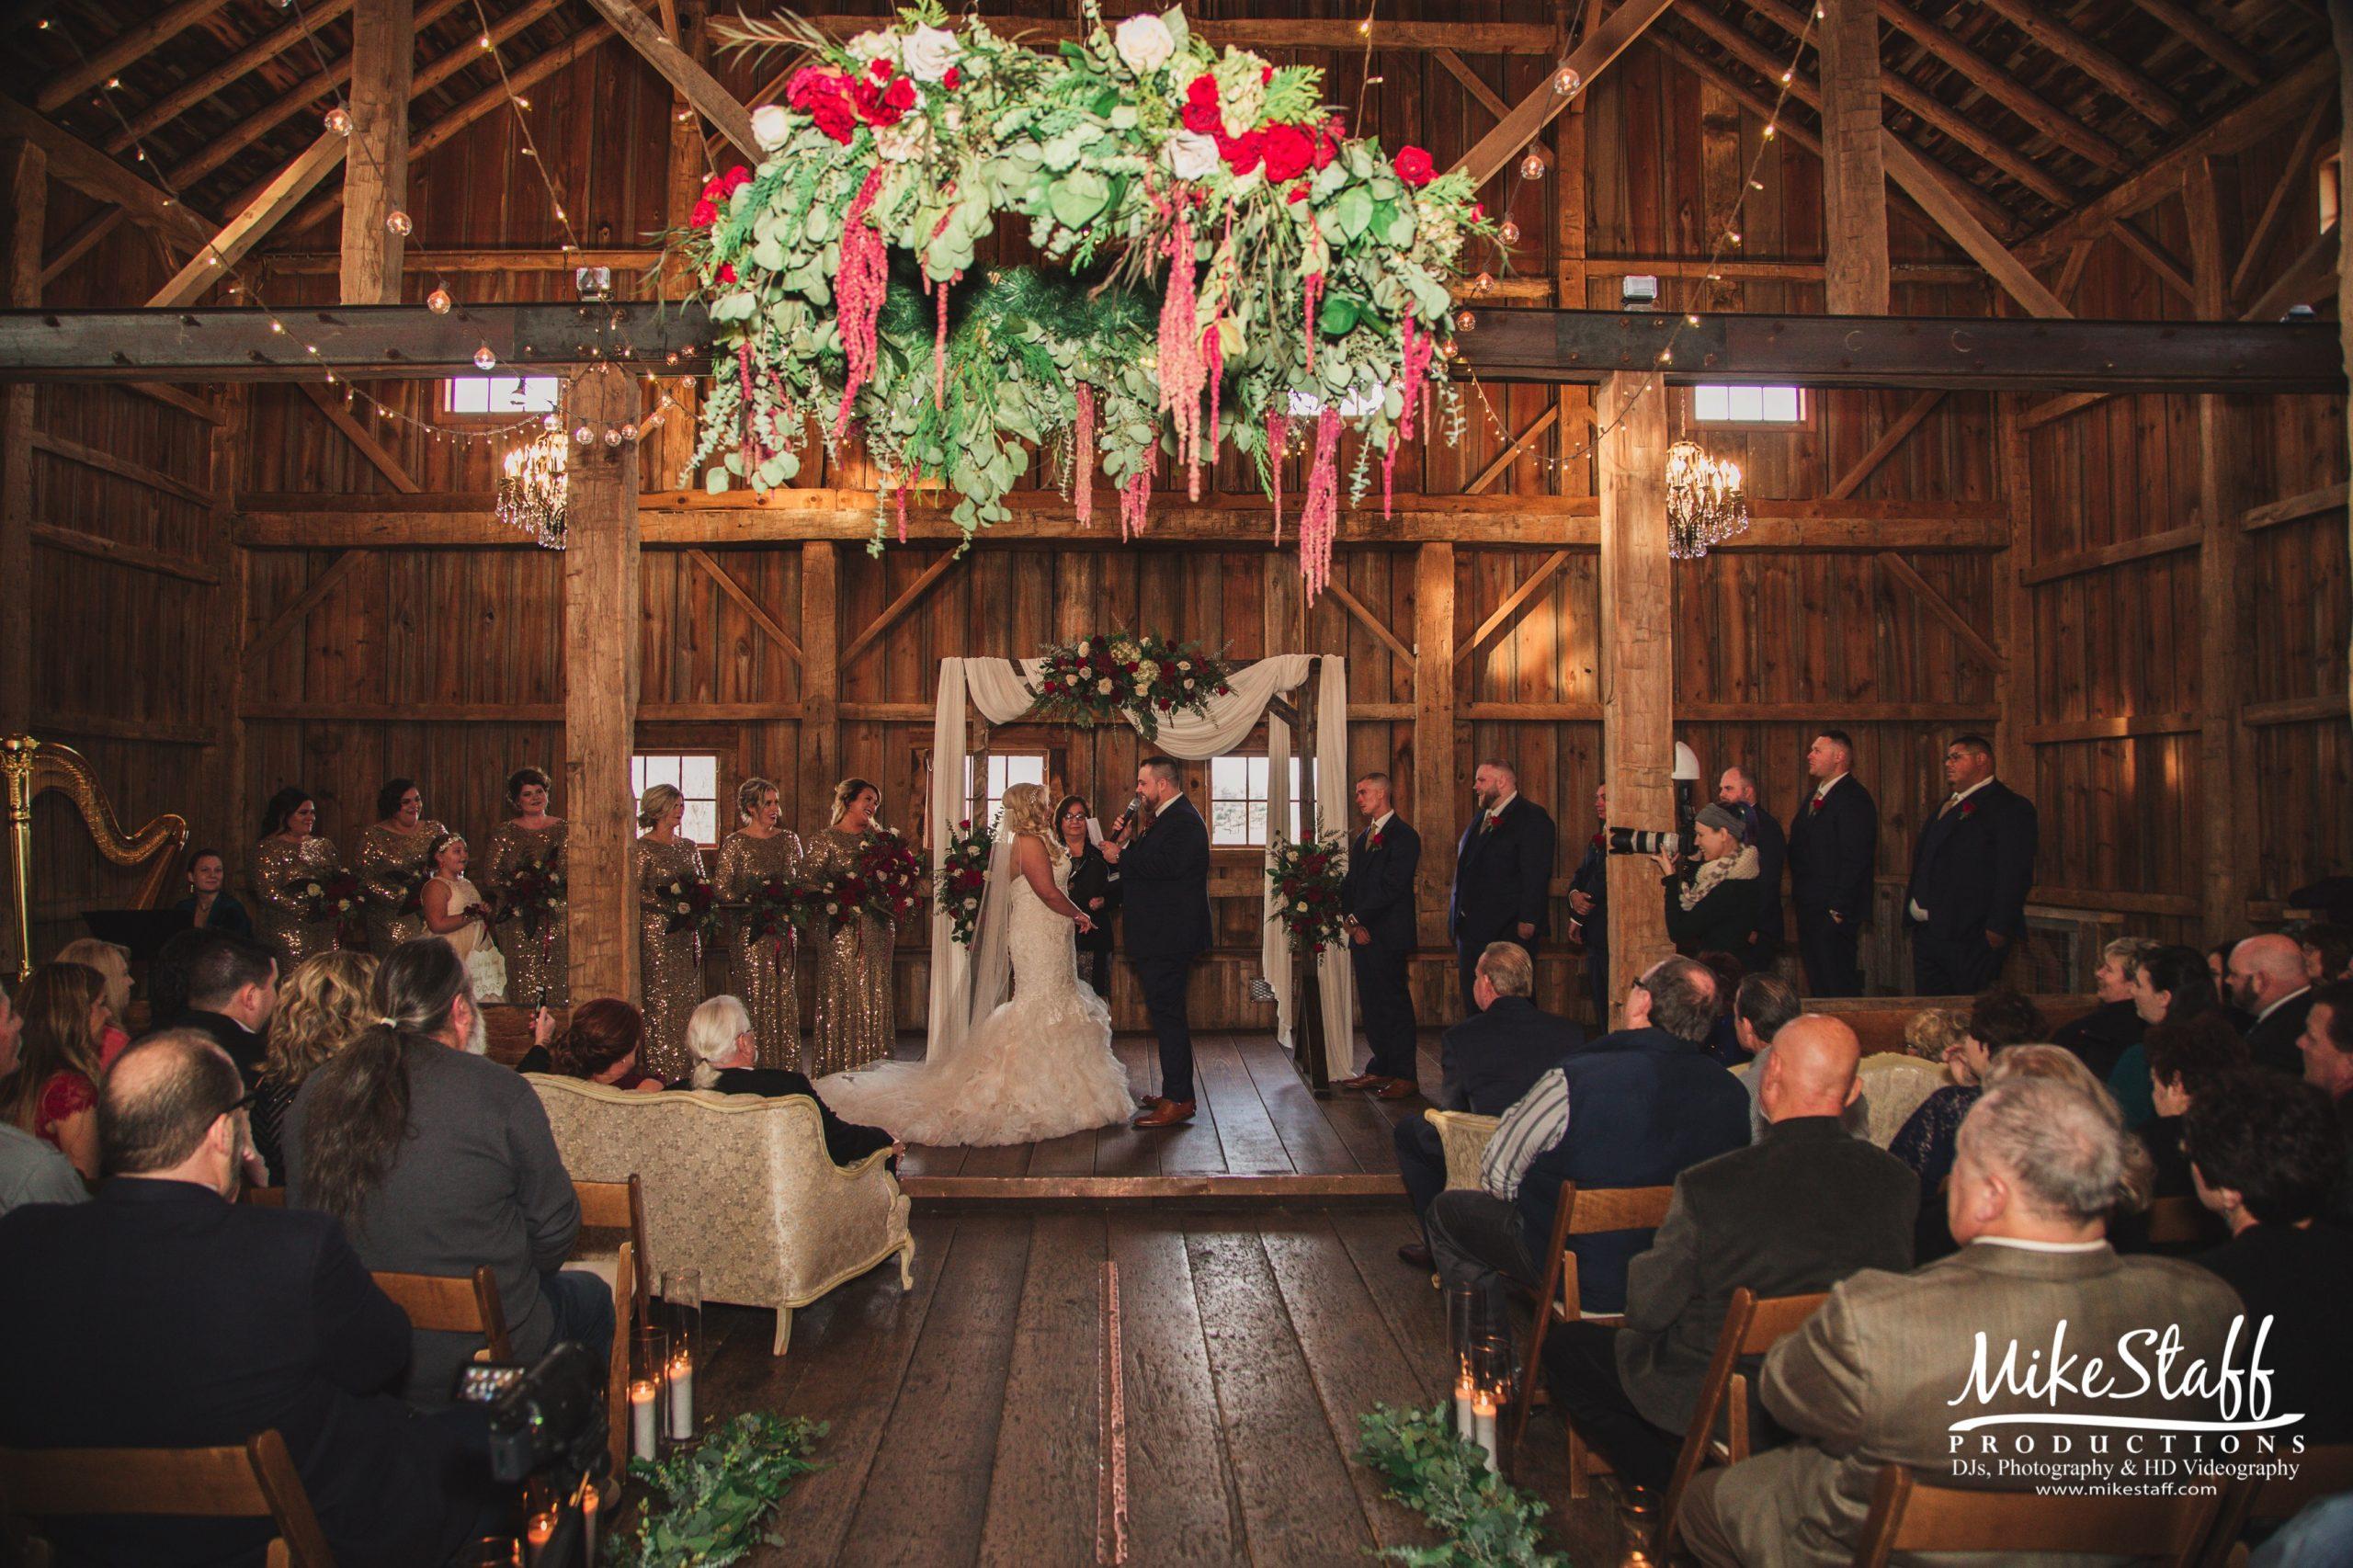 bride and groom at barn wedding ceremony